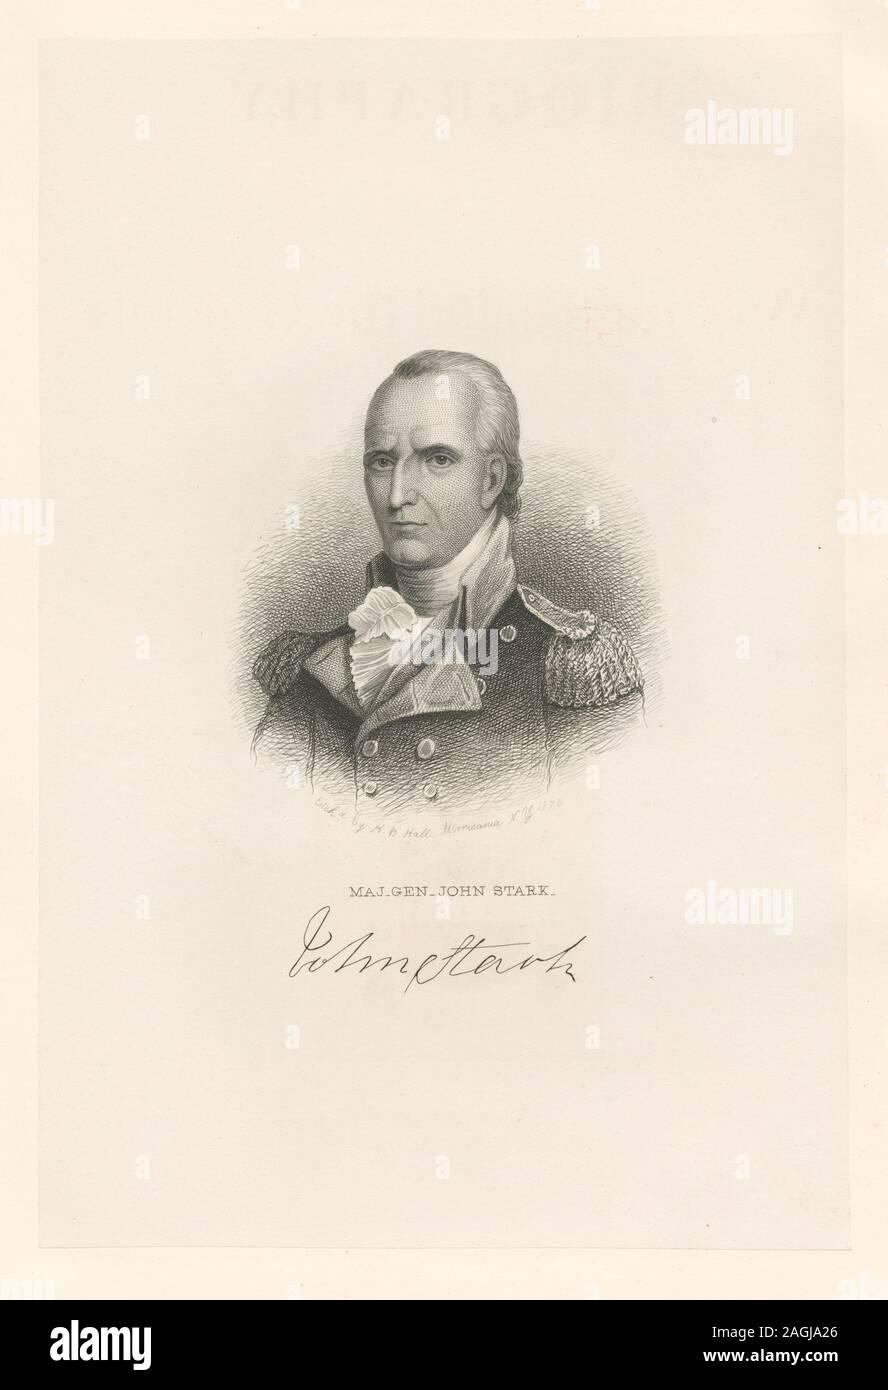 Printmakers include Henry Bryan Hall and Luigi Schiavonetti. EM8505 Statement of responsibility: H.B. Hall; Maj. Gen. John Stark Stock Photo